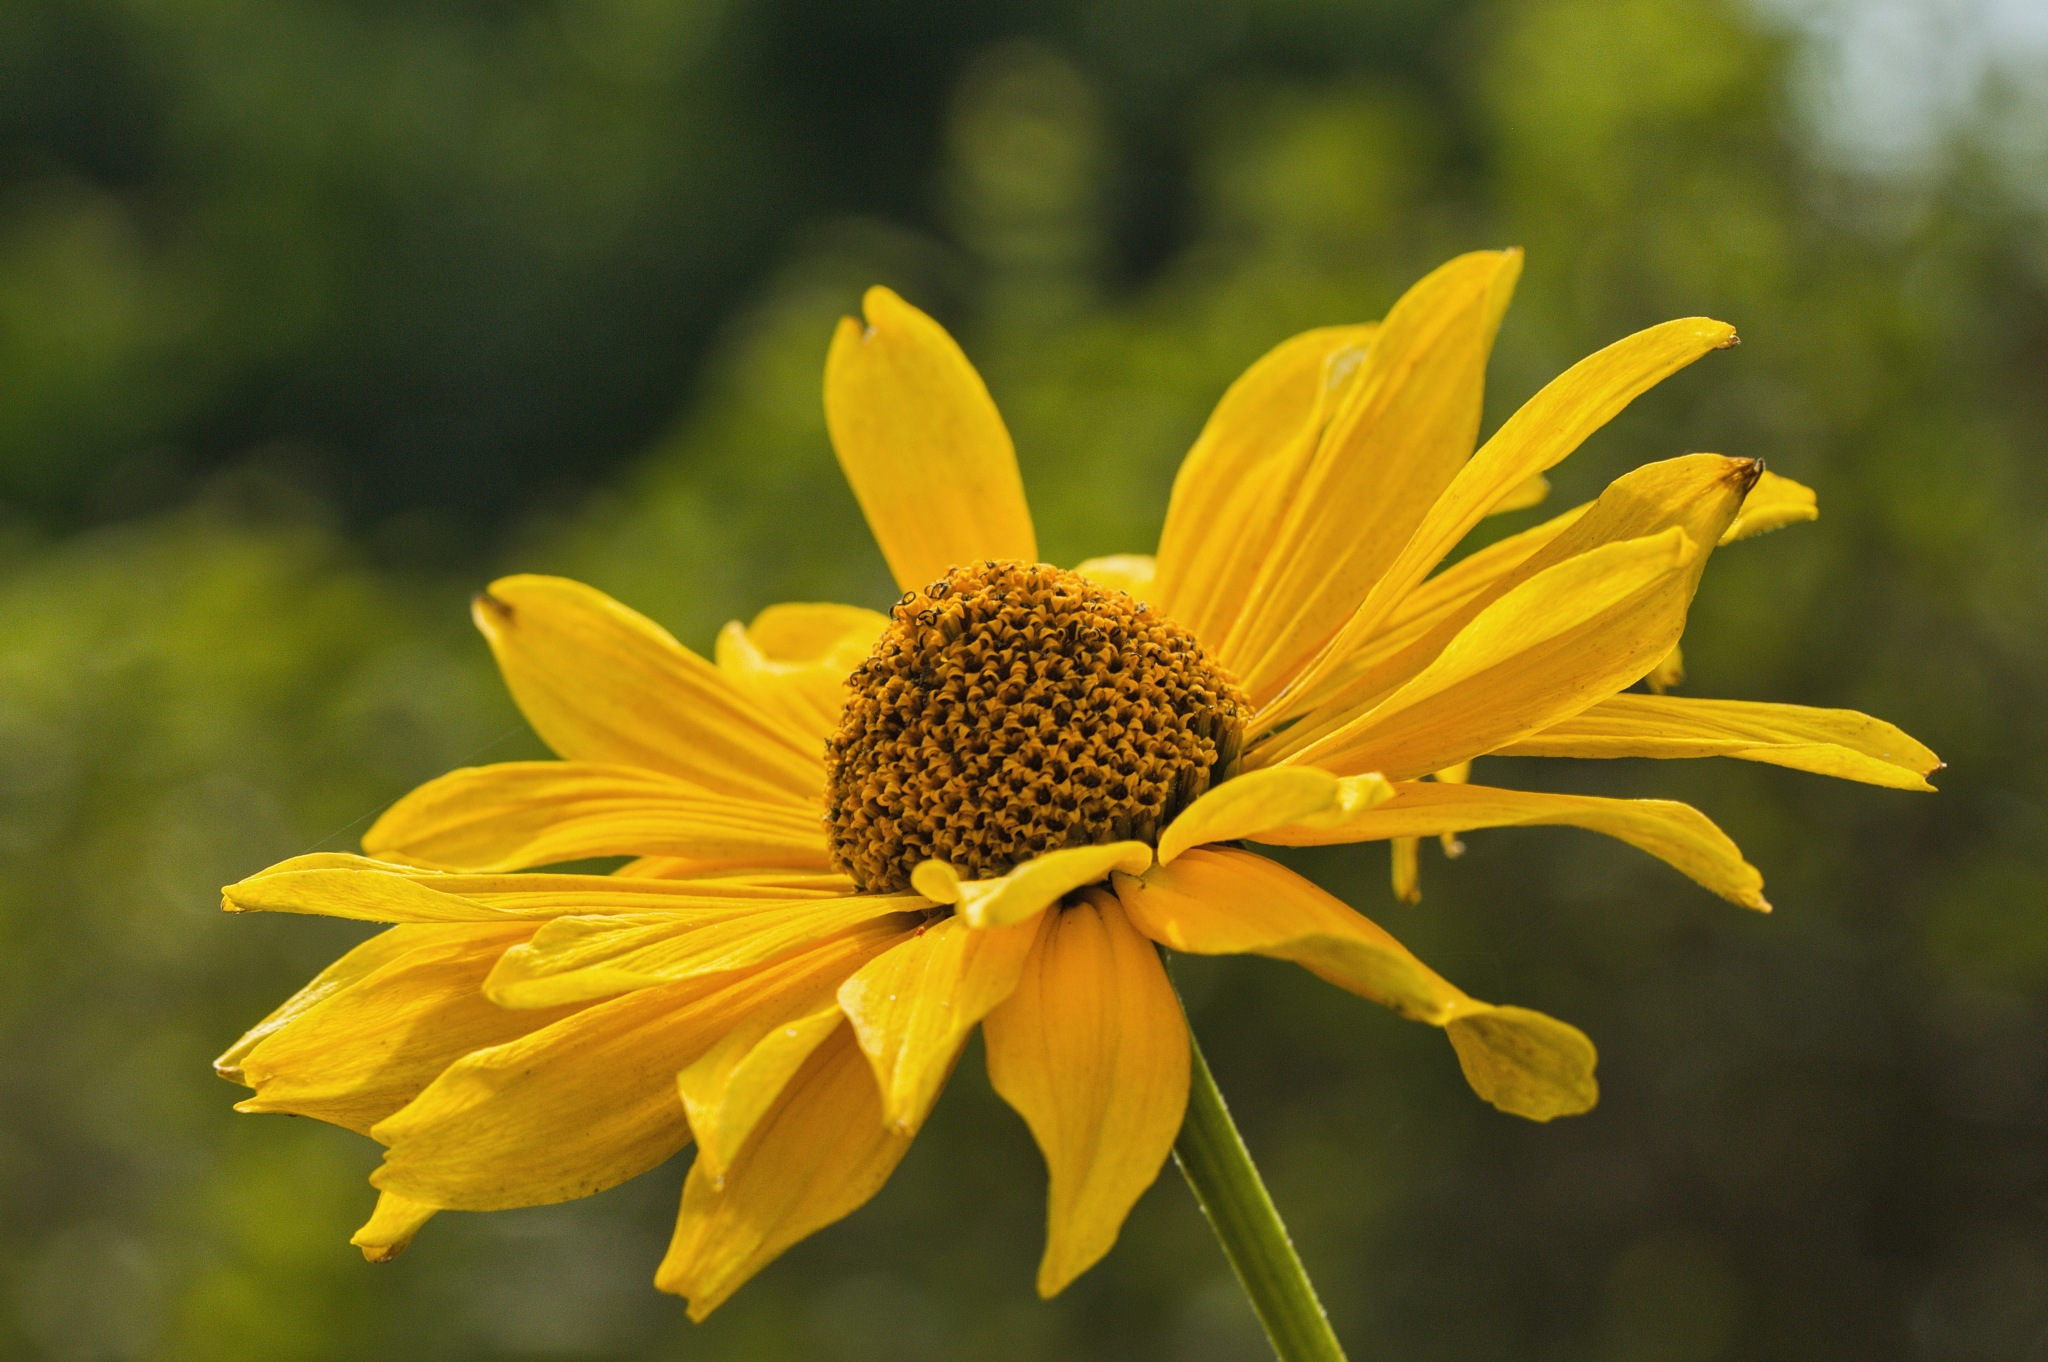 Flower by Kuba Šír